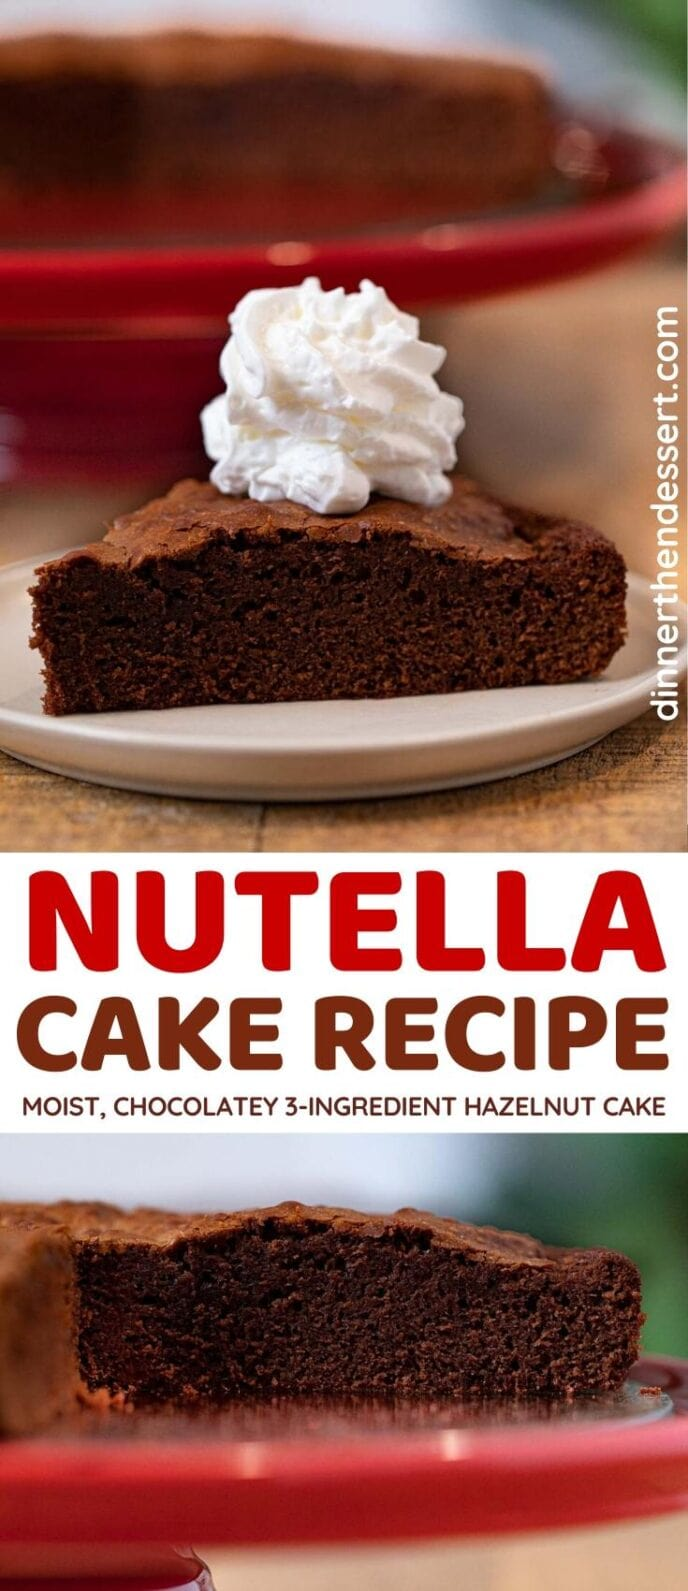 Nutella Cake collage